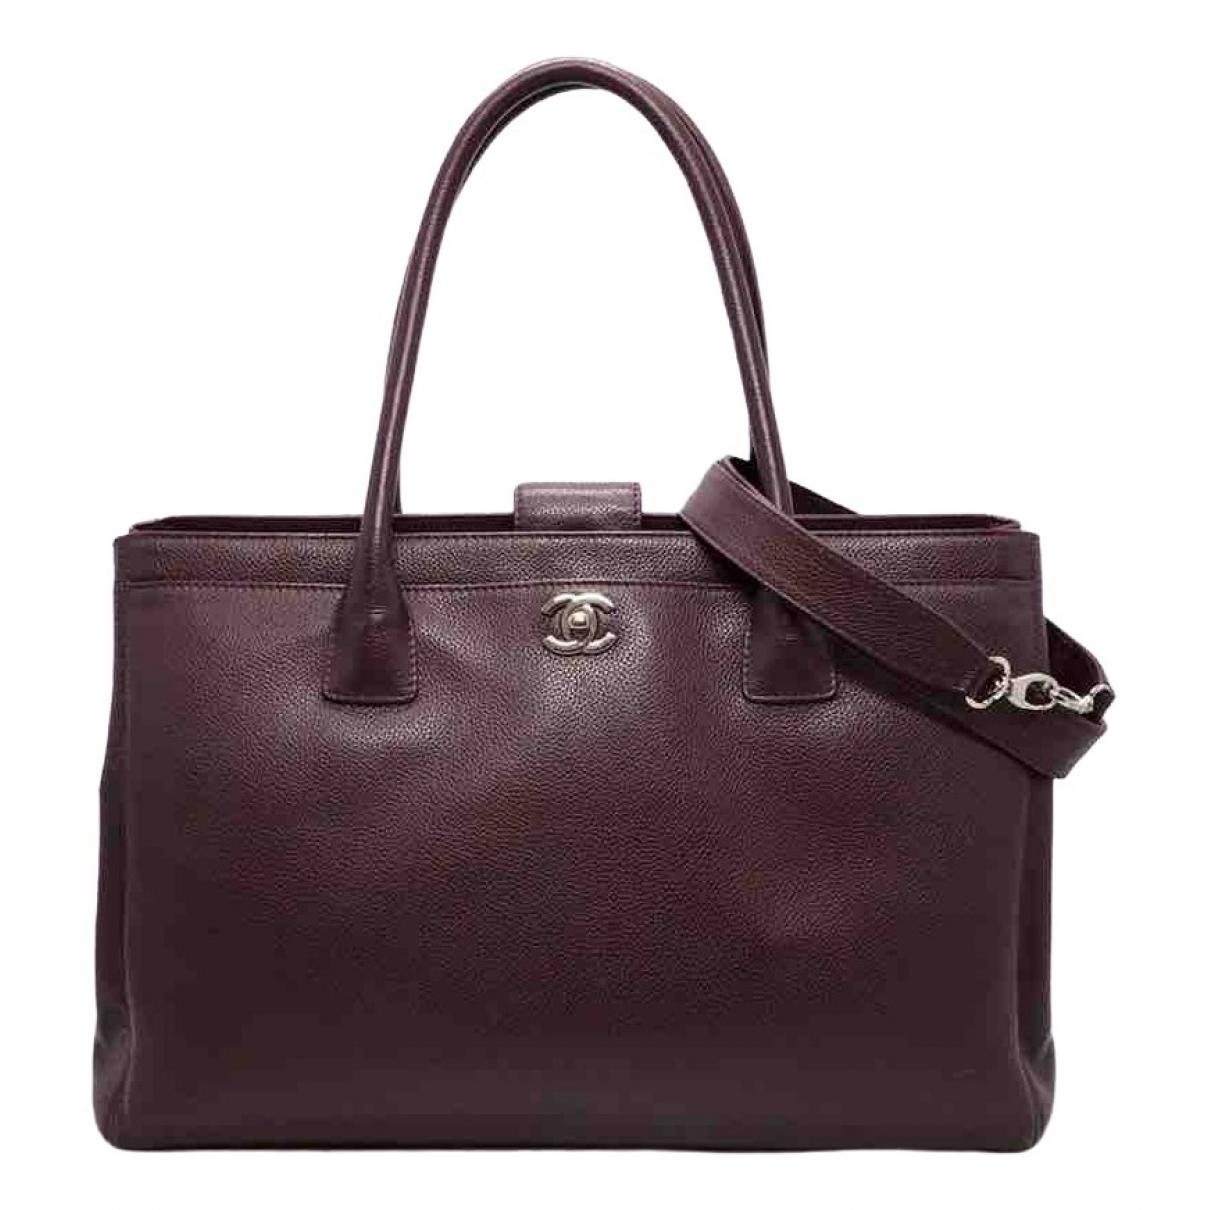 Chanel Executive Burgundy Leather handbag for Women \N